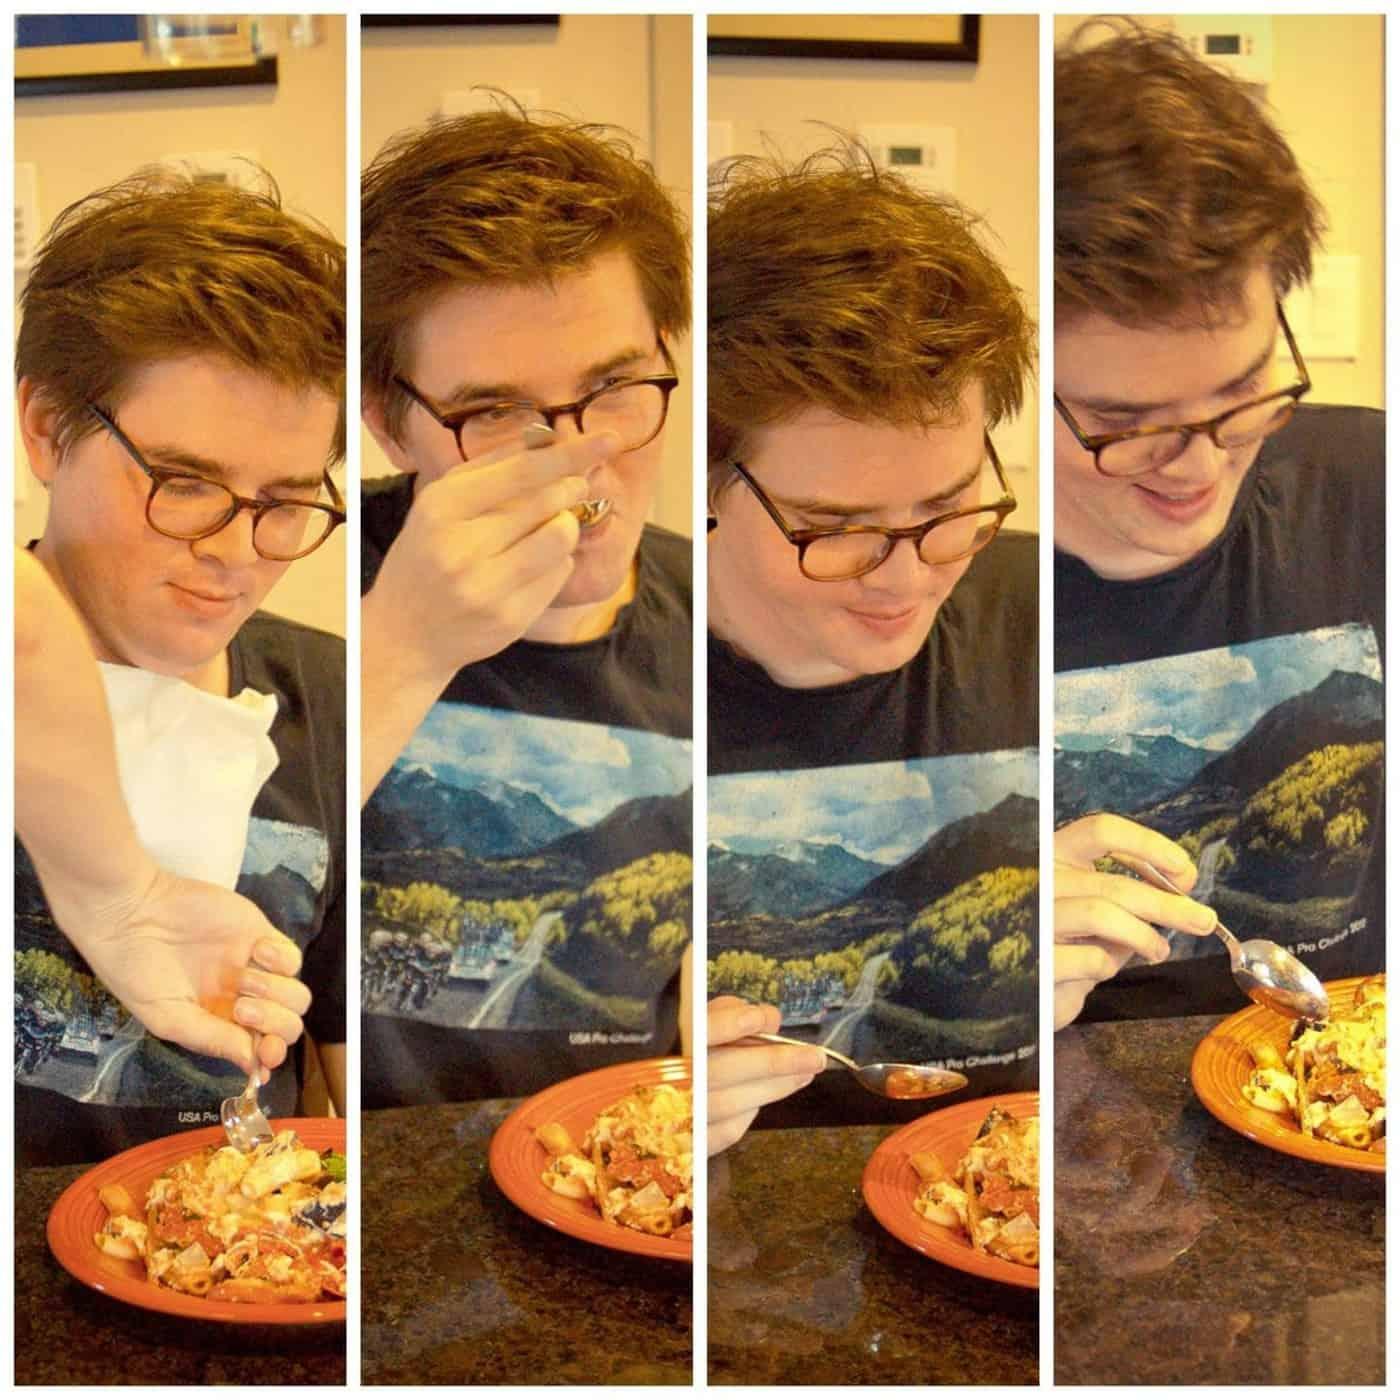 Alex evaluates the meal